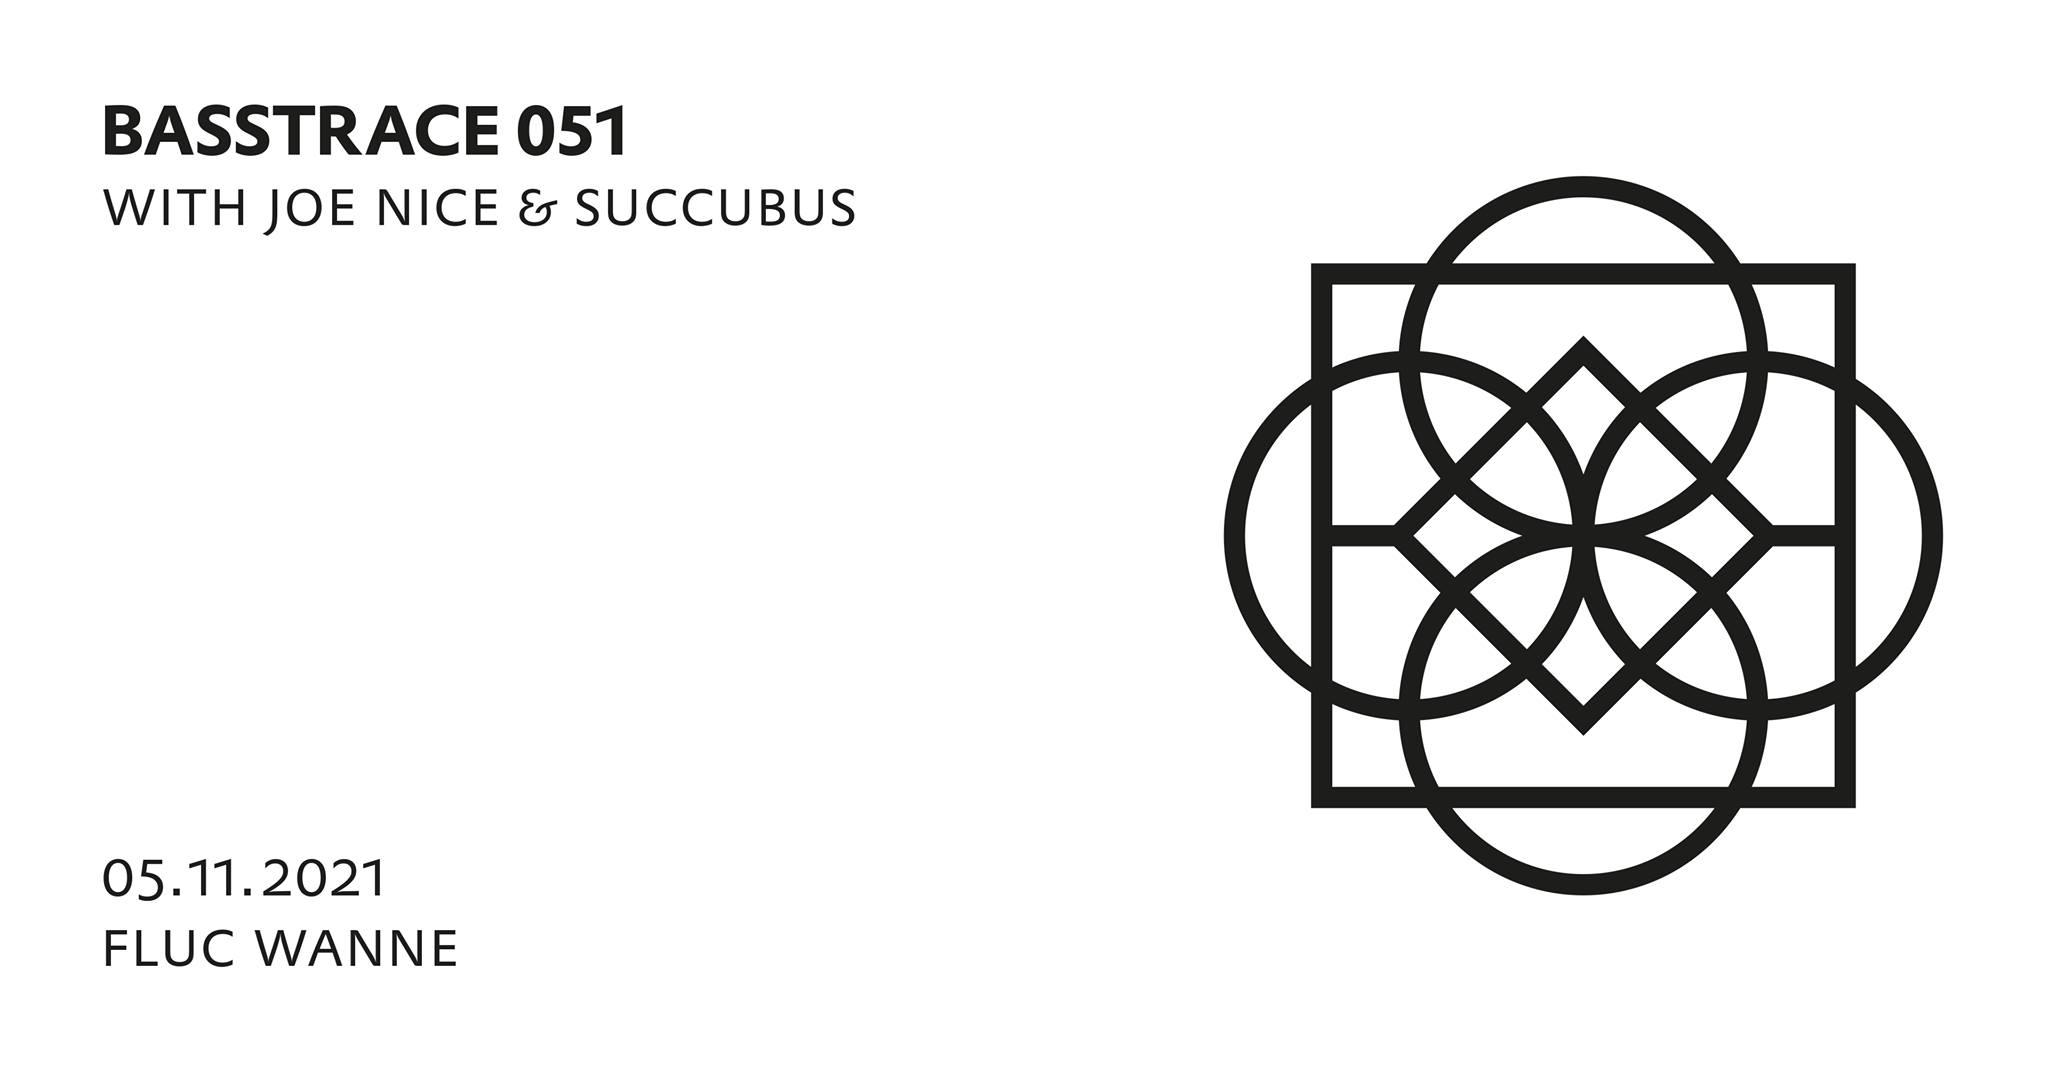 Events Wien: BASSTRACE 051 with Joe Nice & Succubus